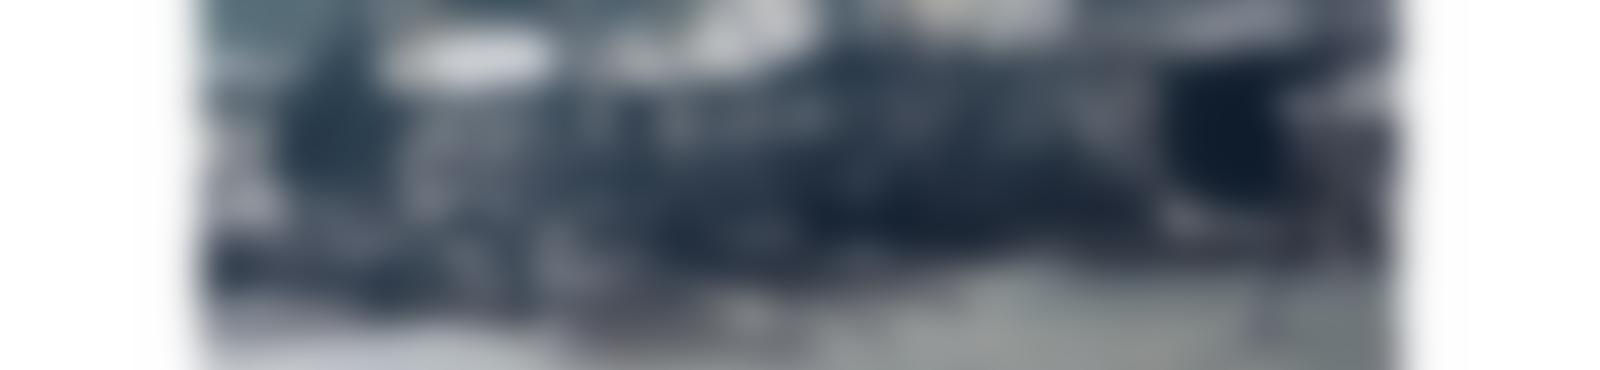 Blurred 07c8239e d7f5 4cd6 9928 1665861820fd